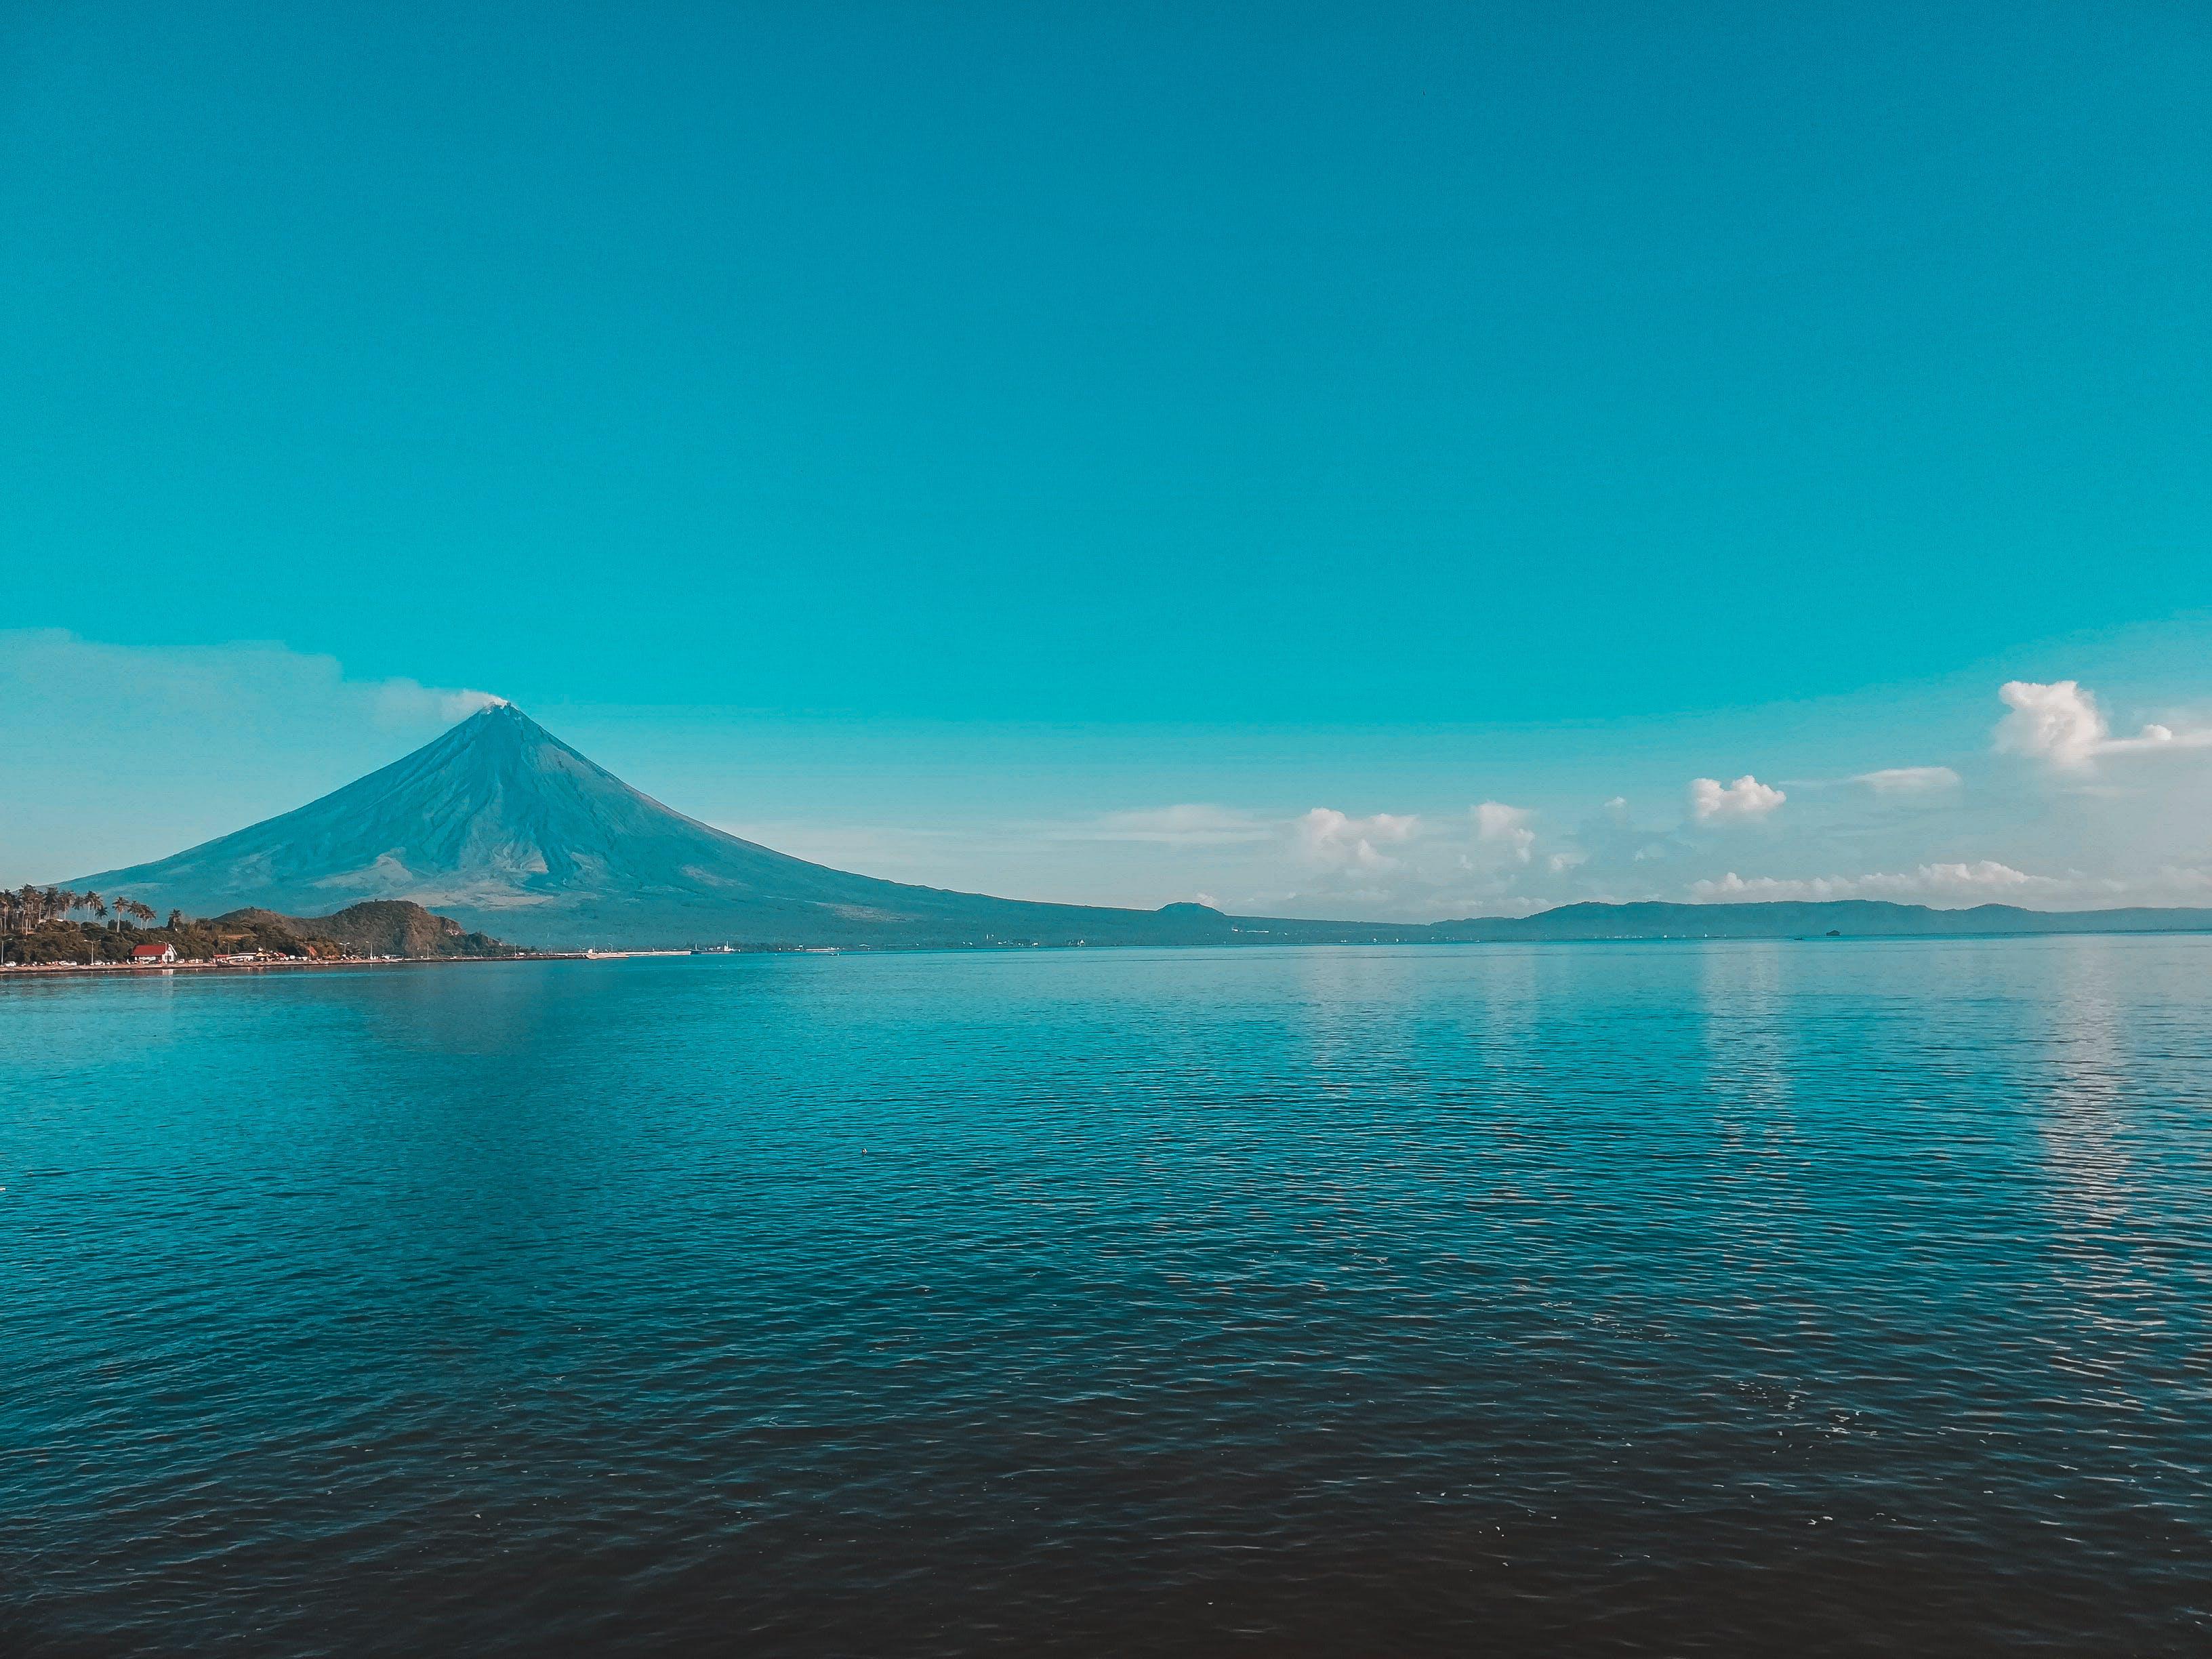 Kostenloses Stock Foto zu meer, wolken, blau, vulkan